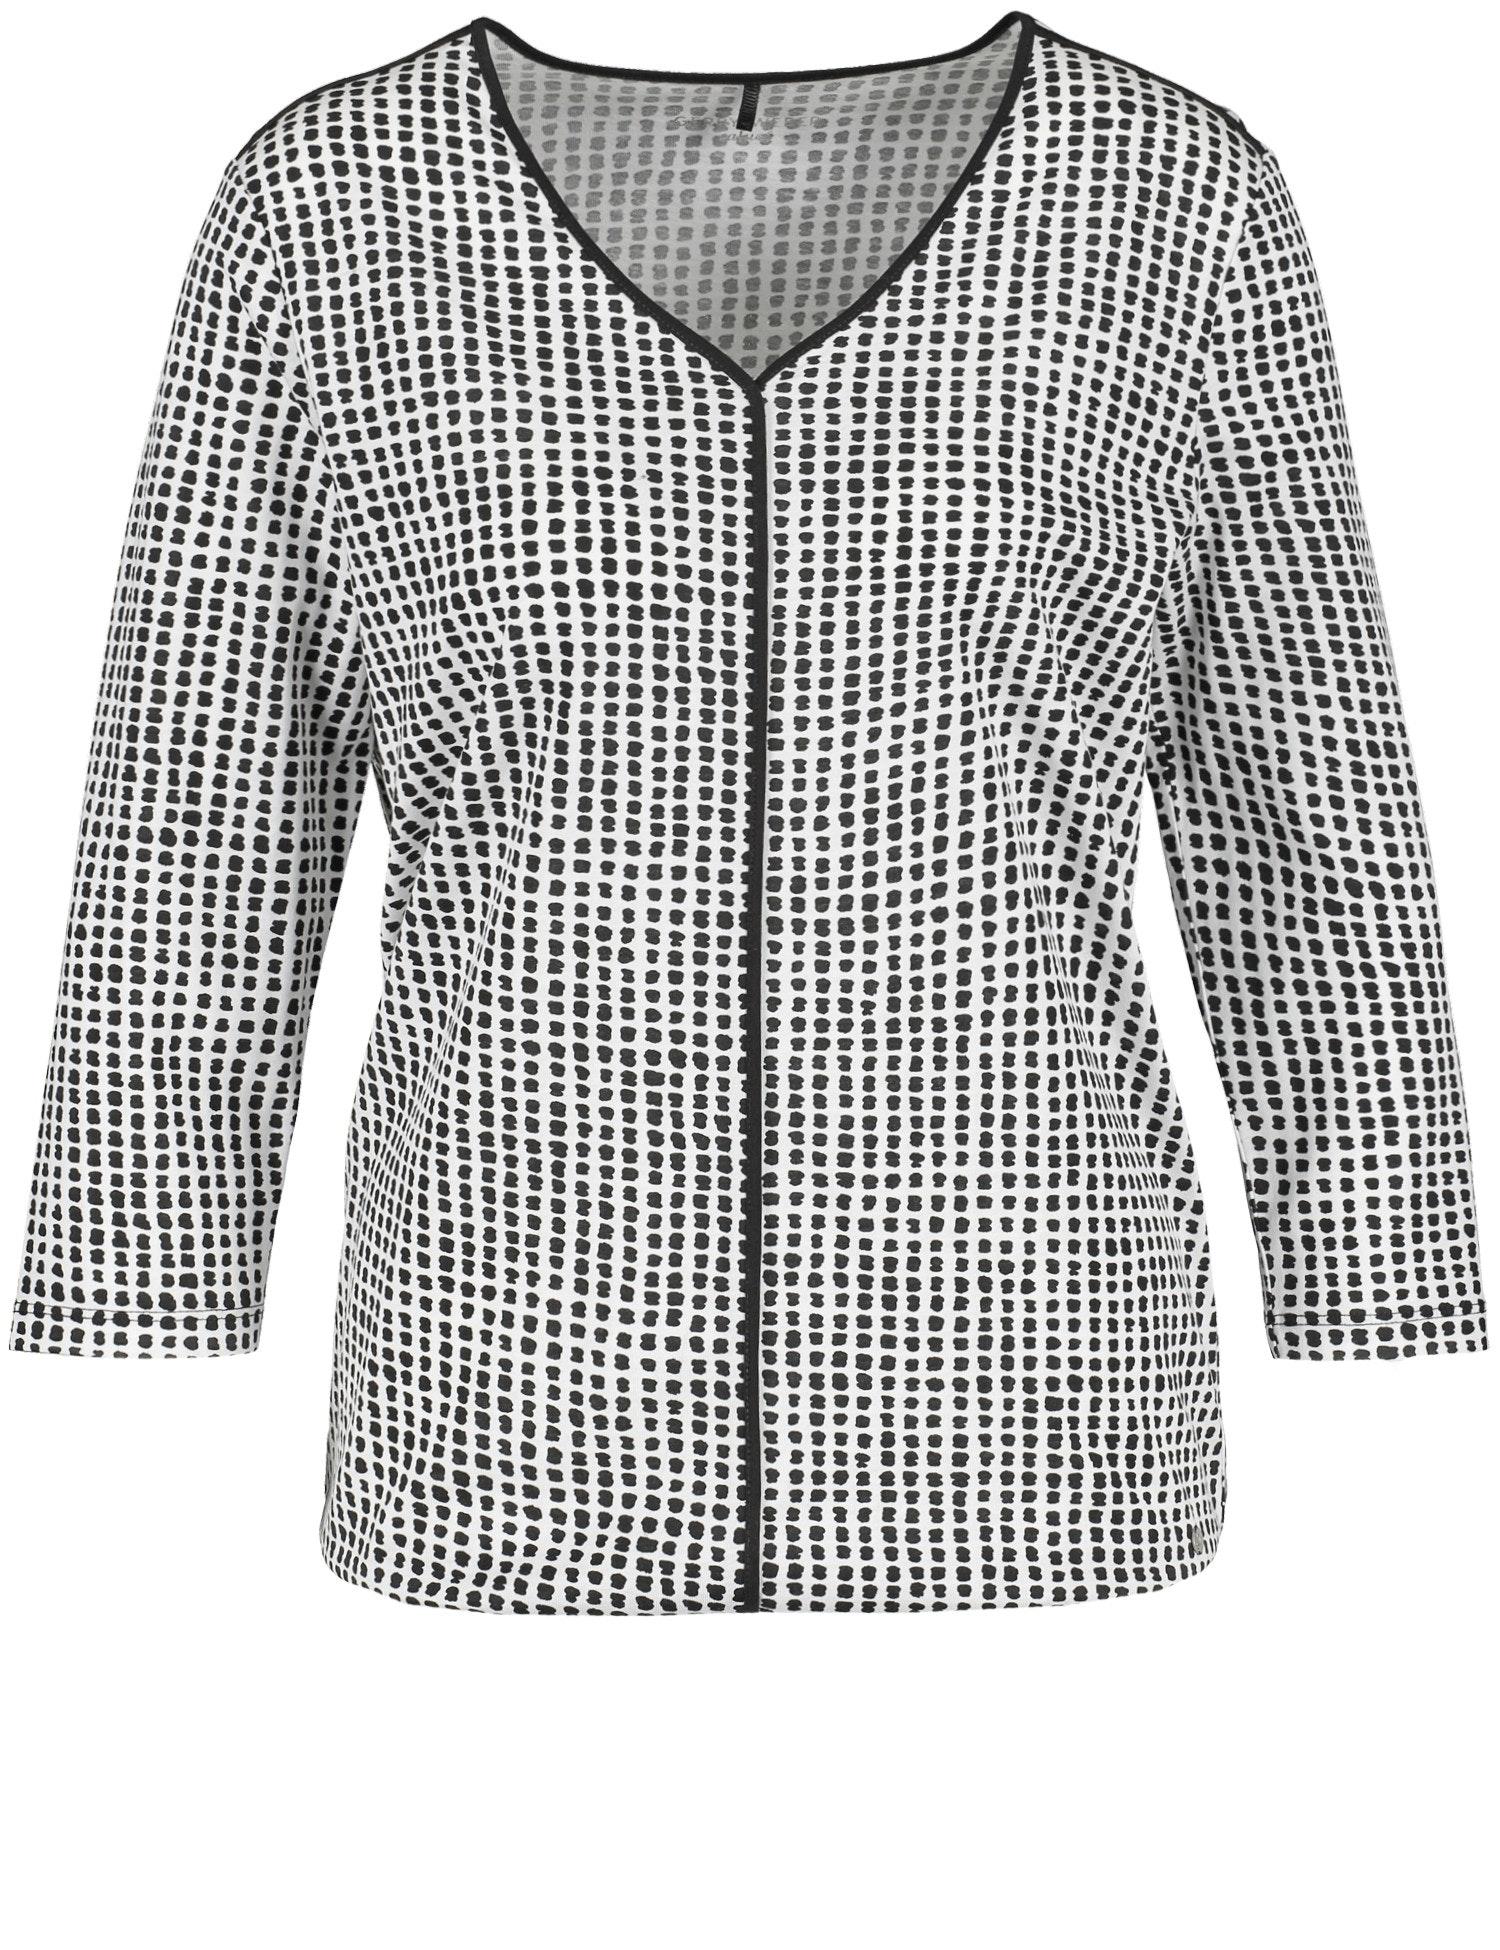 Langarm-Shirt GERRY WEBER